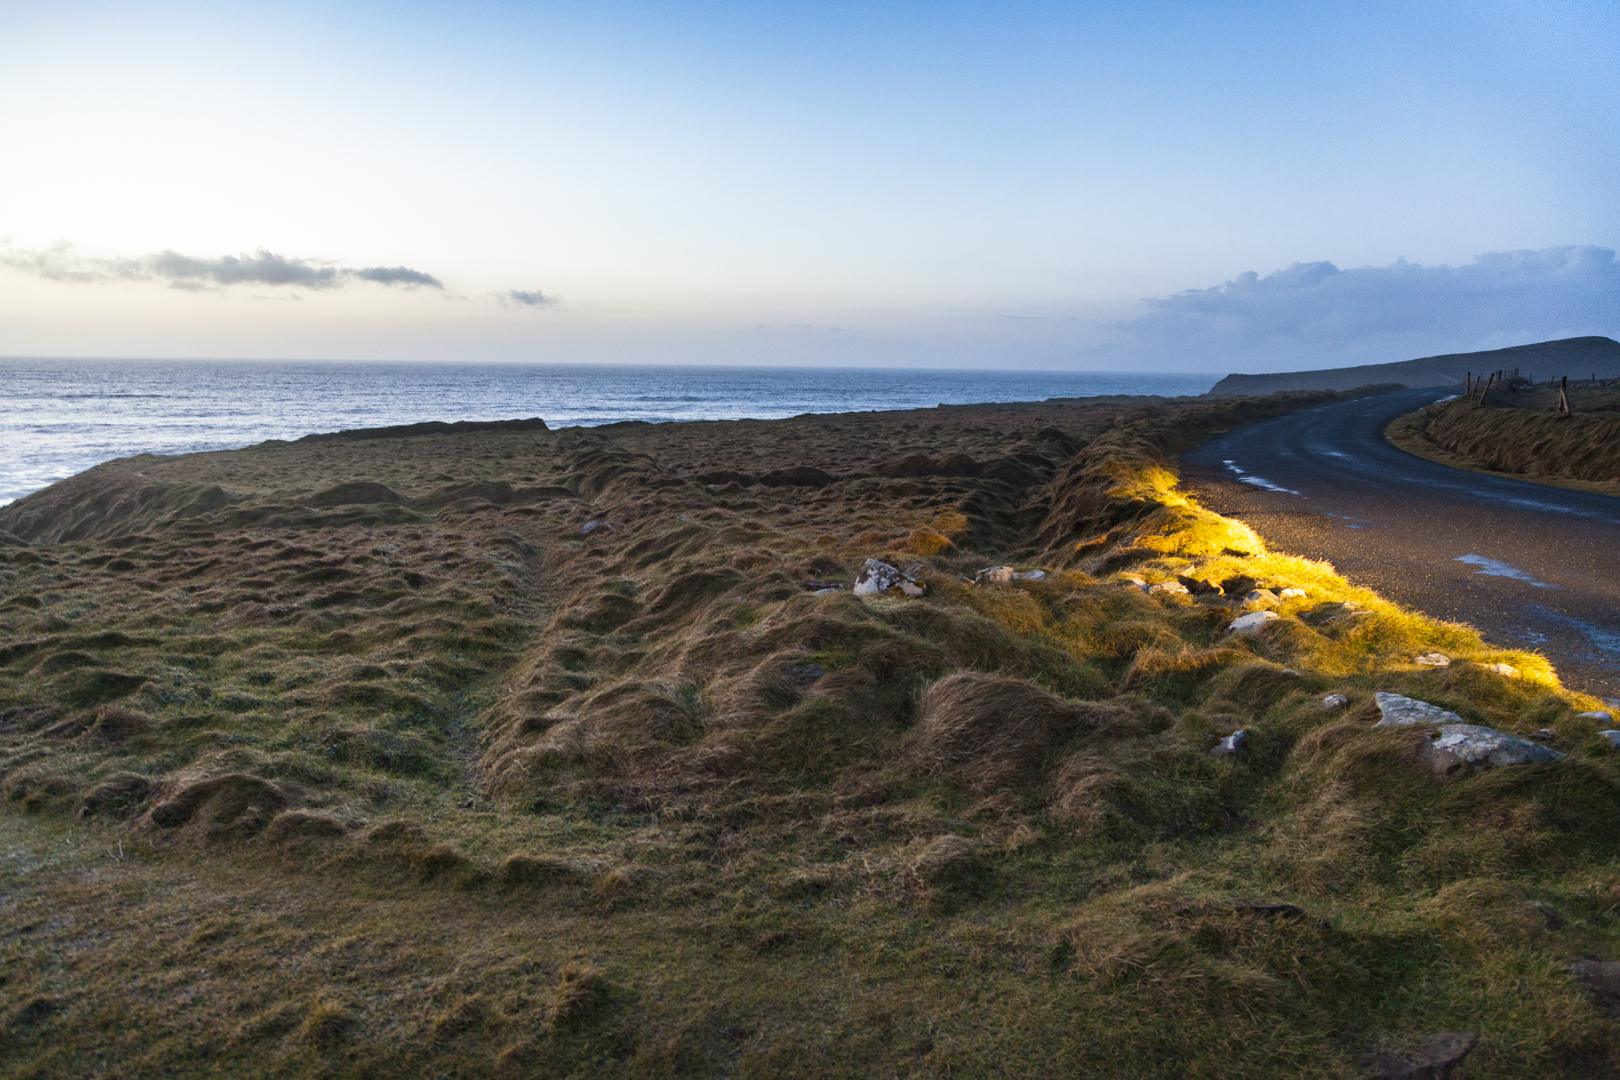 20180219 Mullaghmore Cliffs 069.jpg